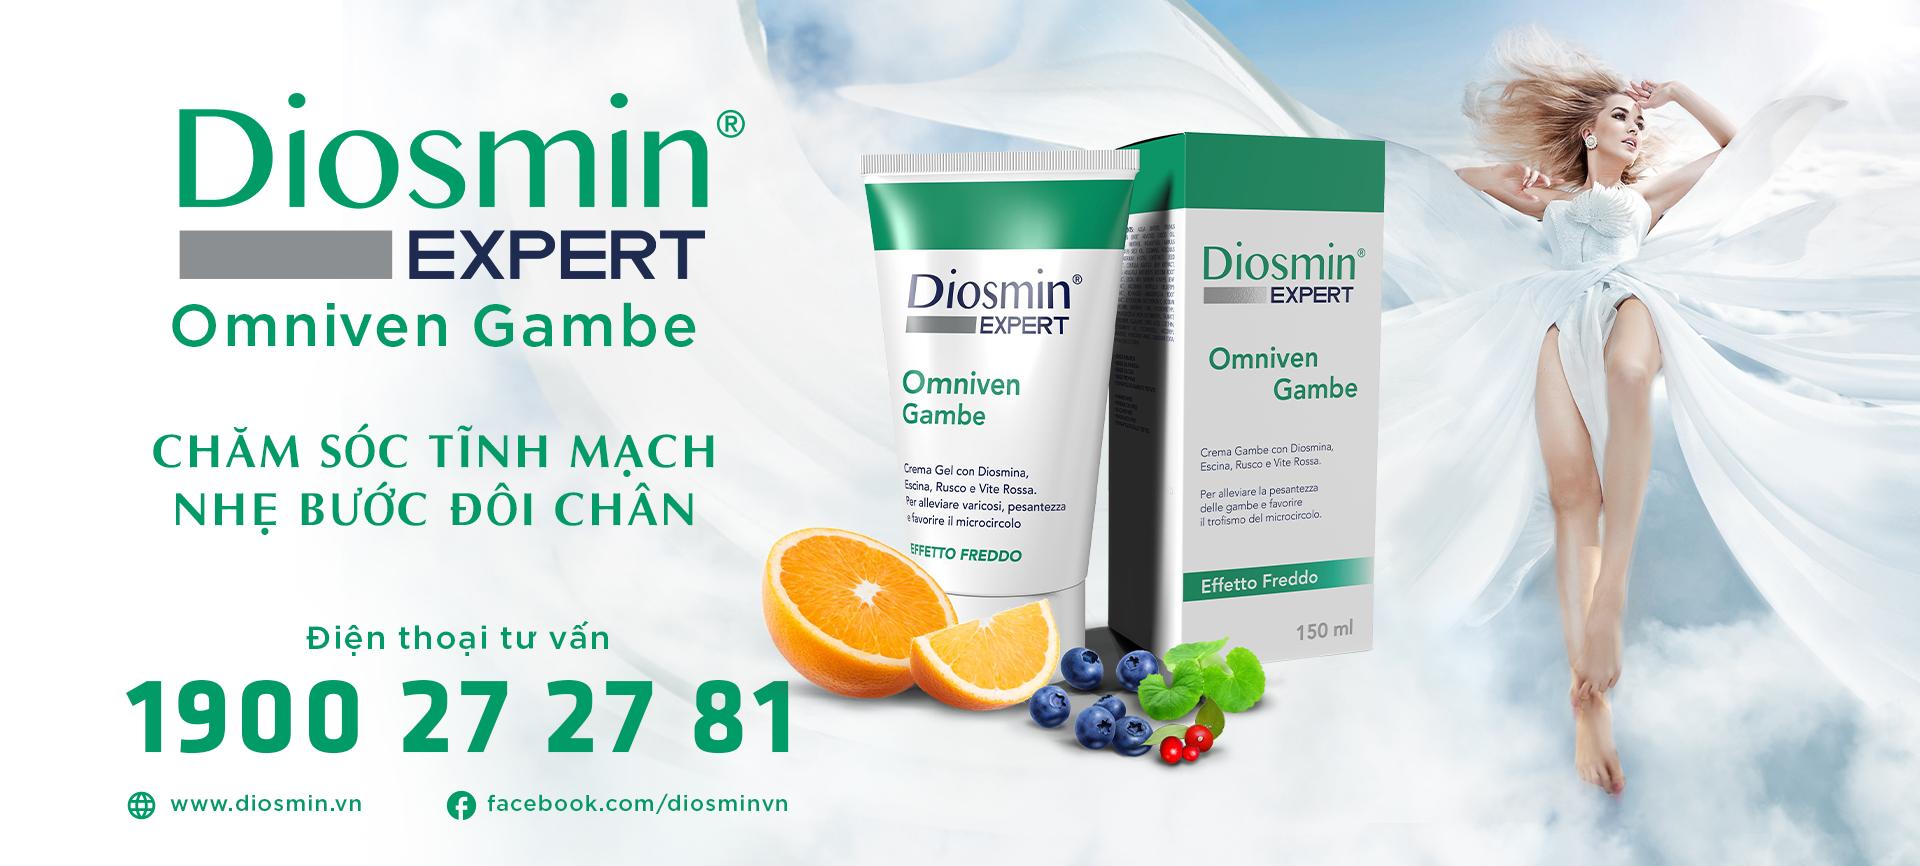 cam-nhan-nha-thuoc-ve-diosmin-expert-tphcm-quan 7